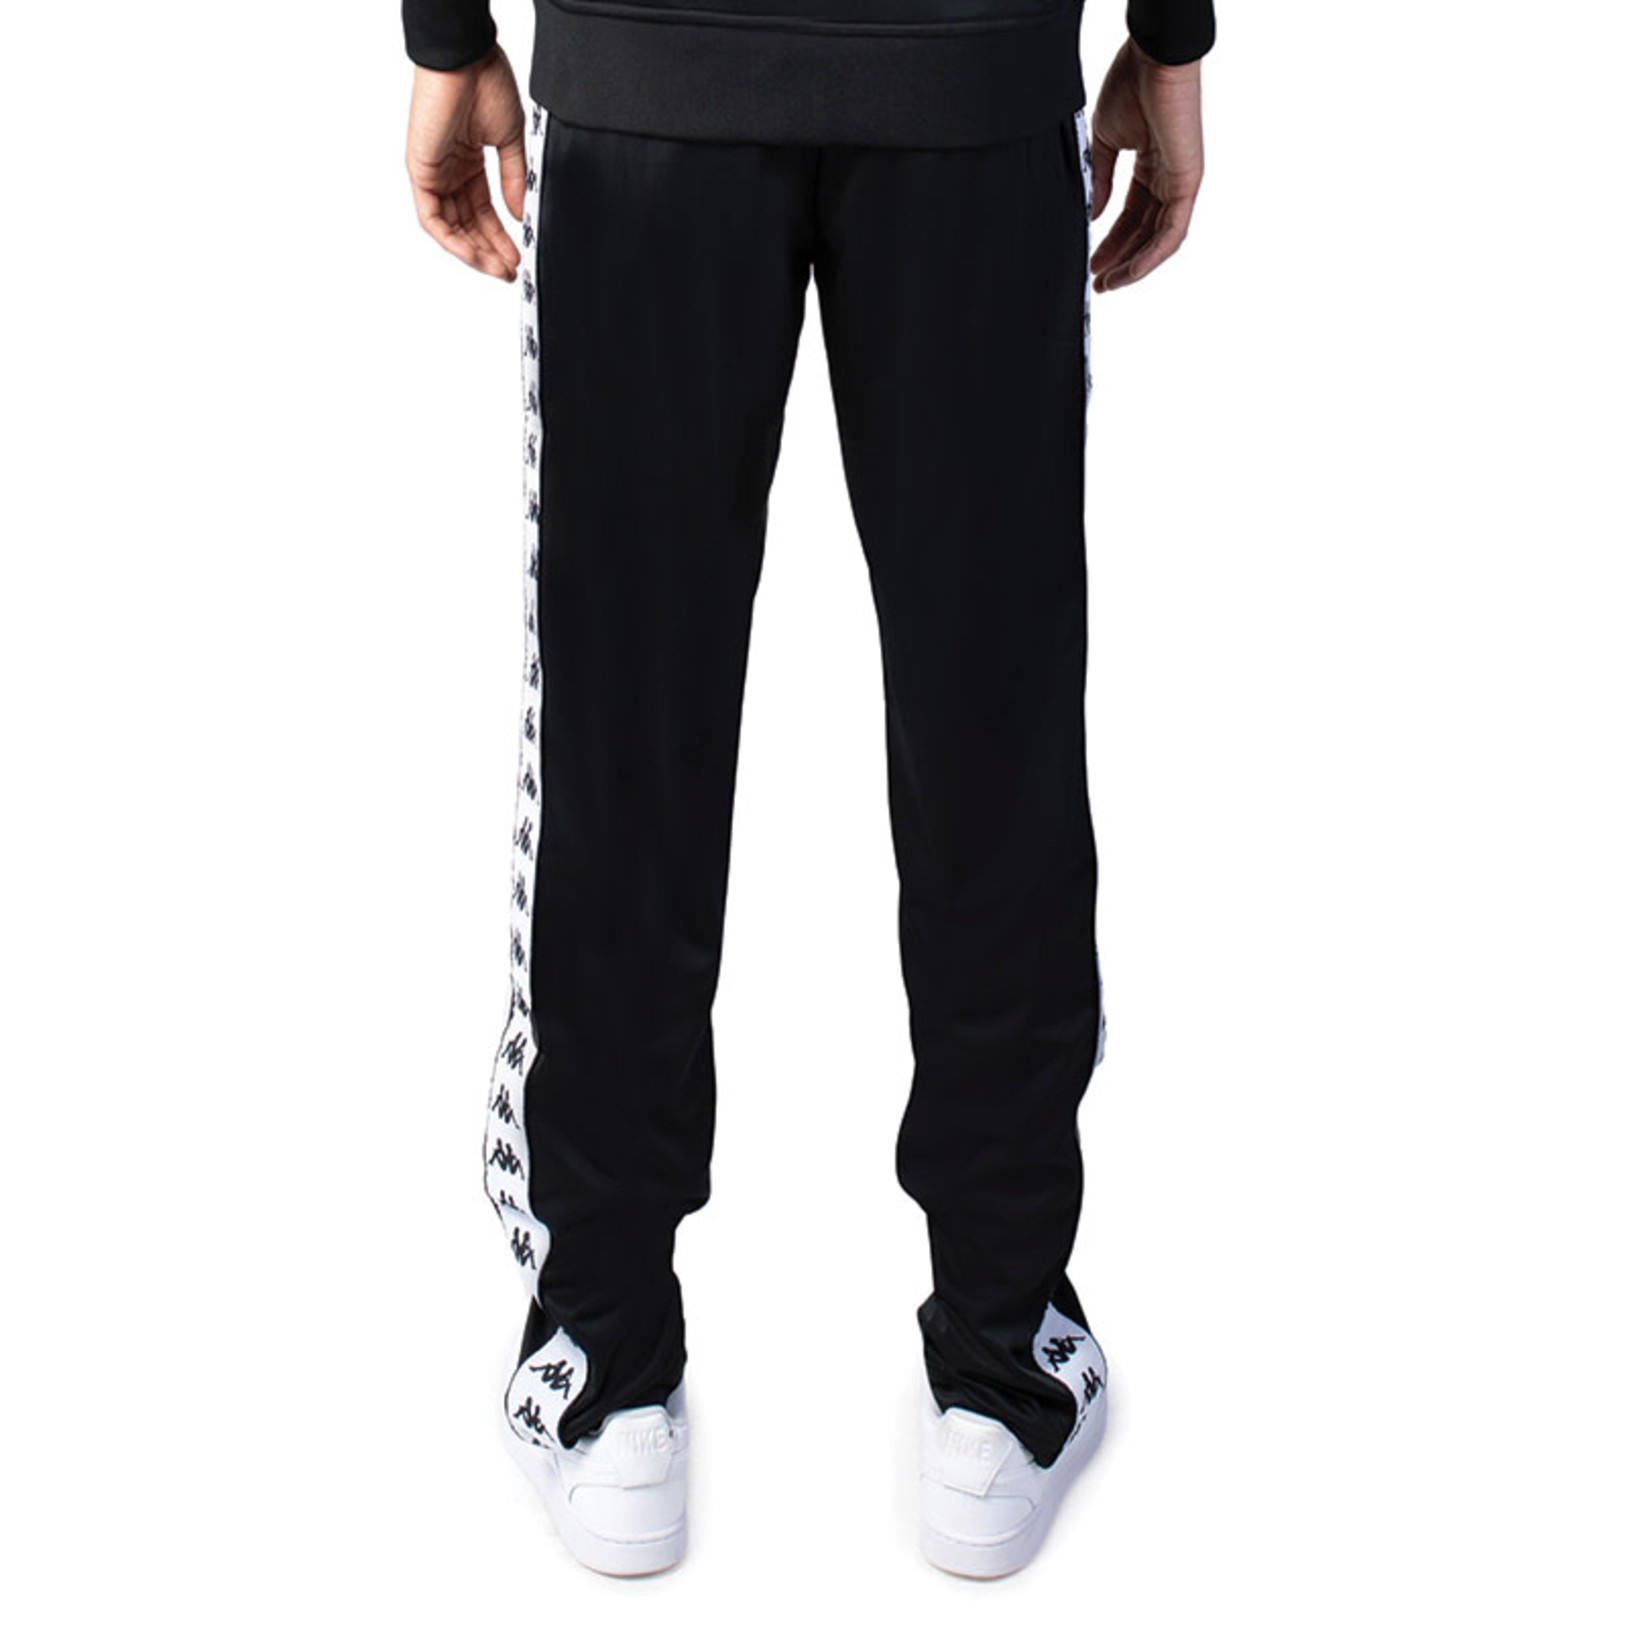 Kappa Kappa : Rastoria Banda Jogger Slim Pants